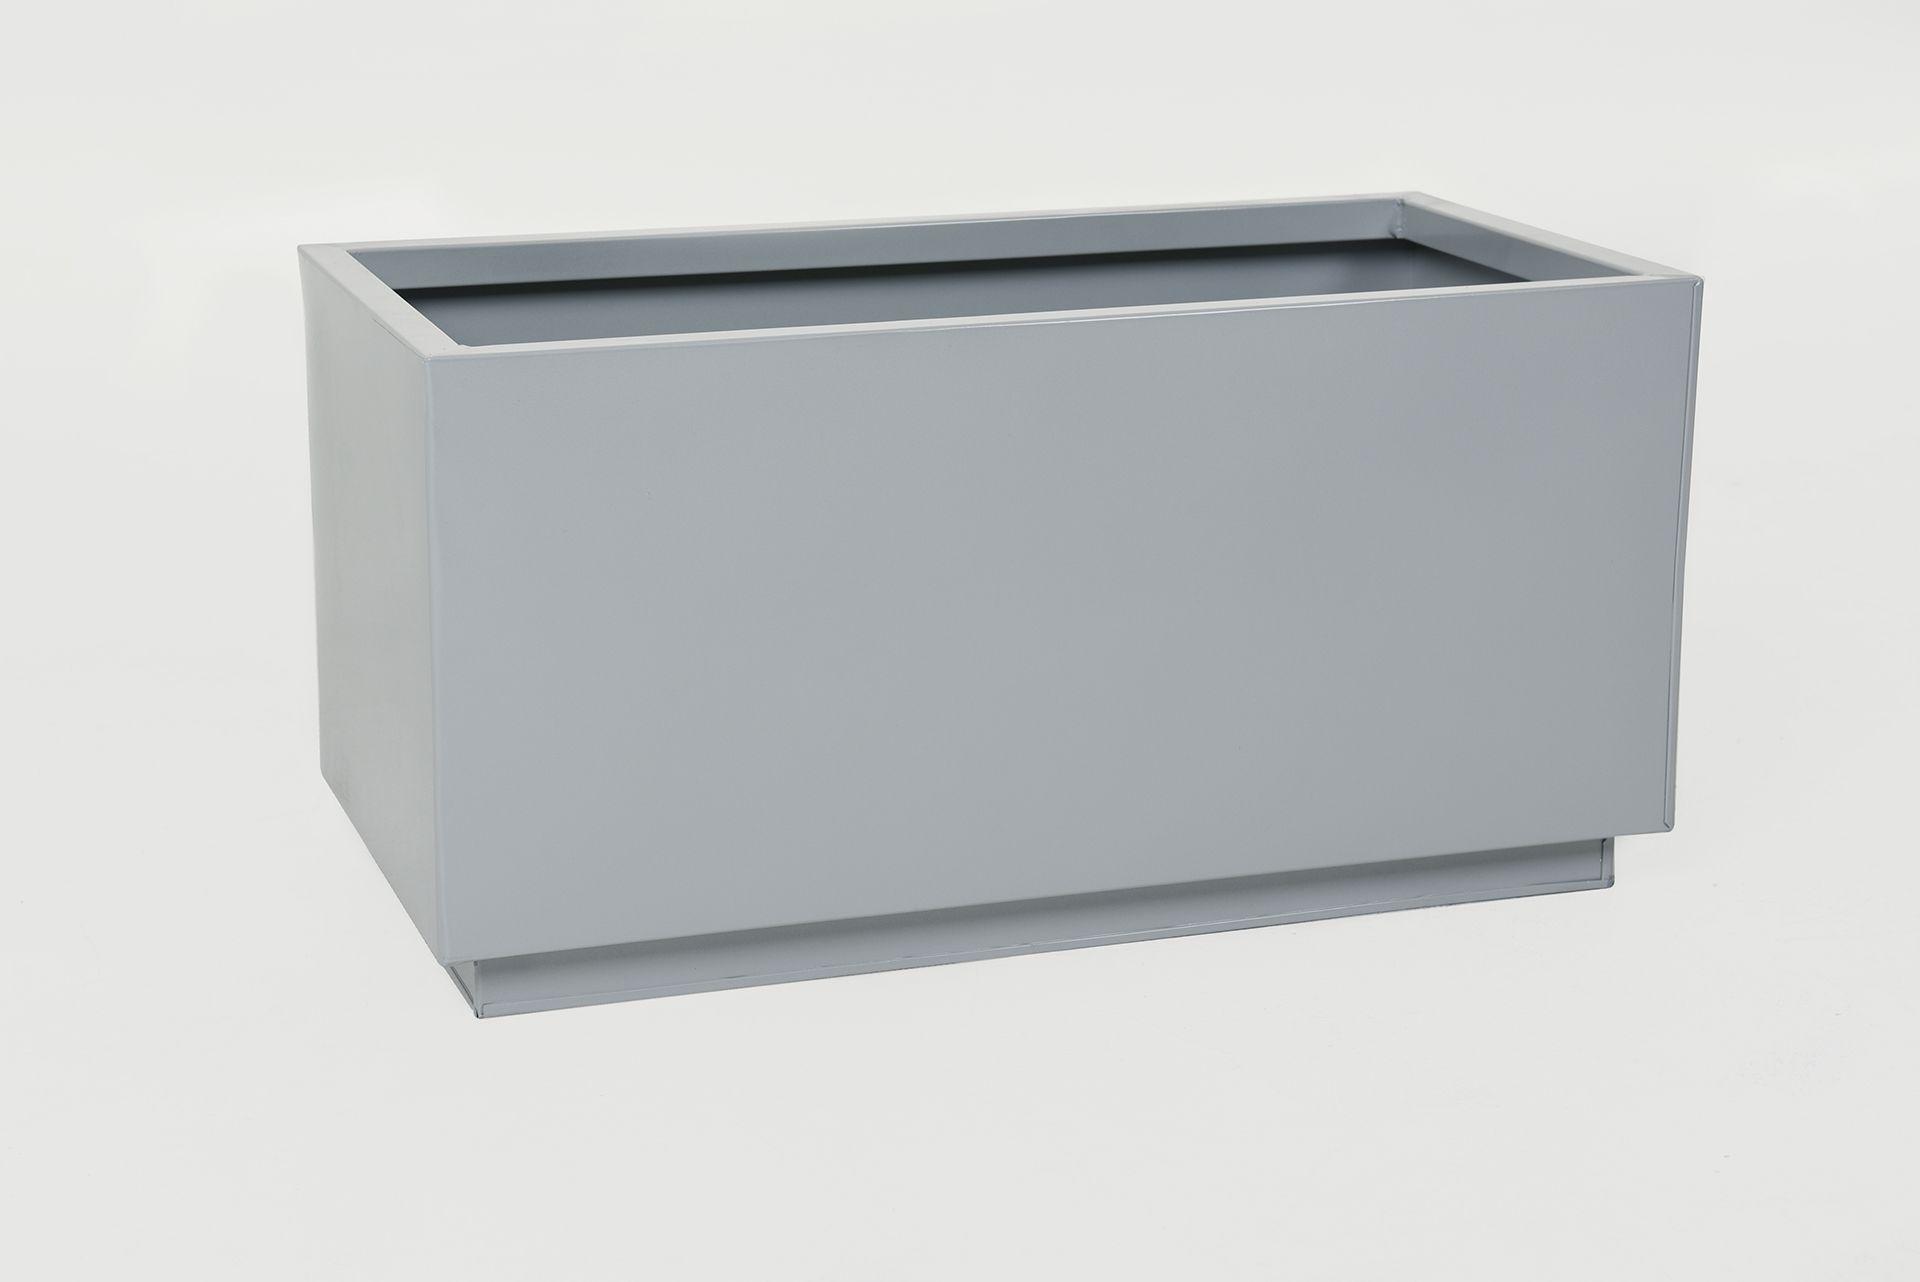 pflanzk bel pflanztrog pulverbeschichtetes stahlblech maxi 60 cm grau ebay. Black Bedroom Furniture Sets. Home Design Ideas